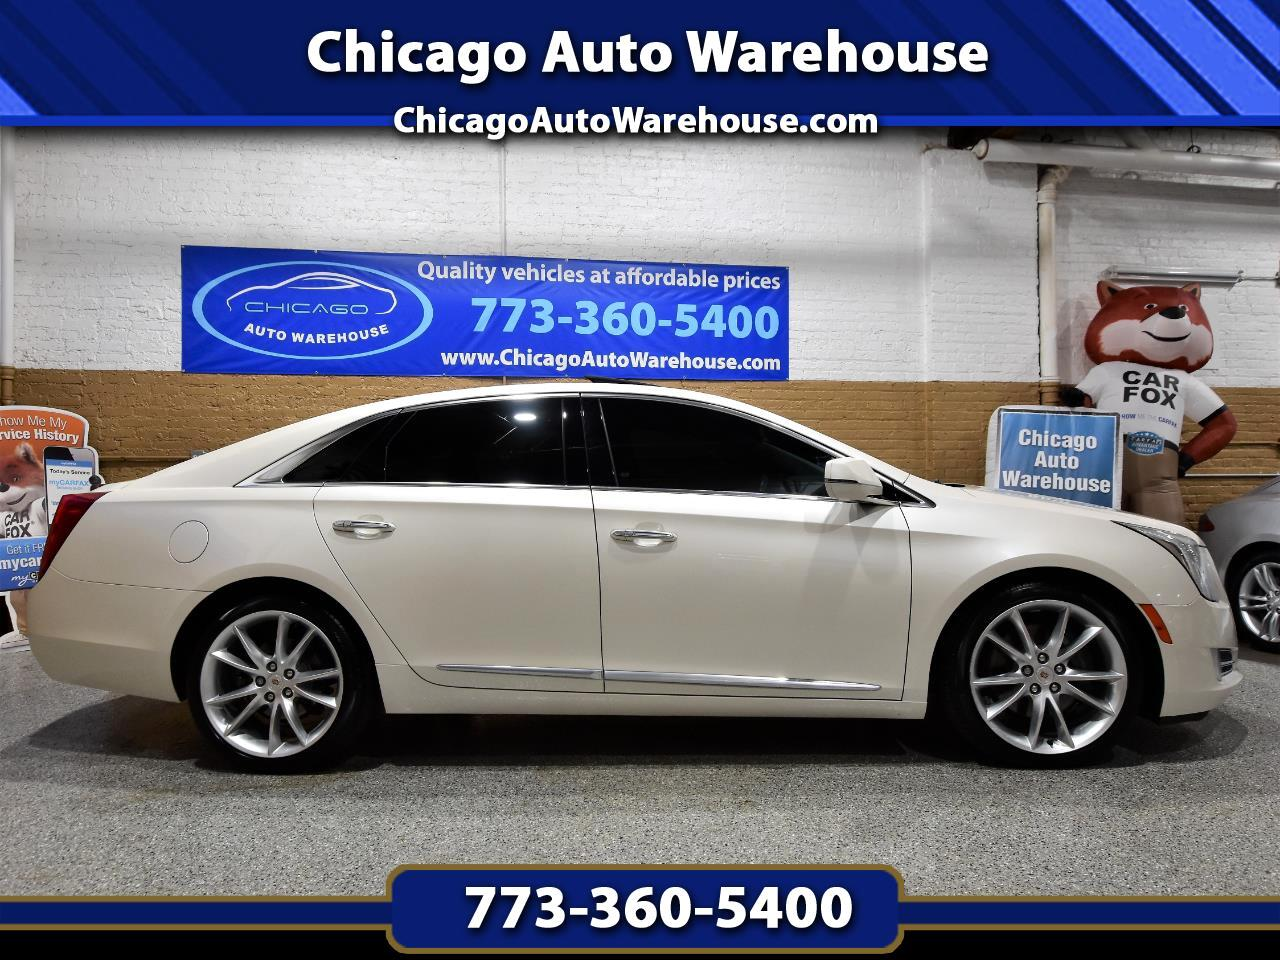 Cadillac XTS 4dr Sdn Vsport Platinum AWD 2015